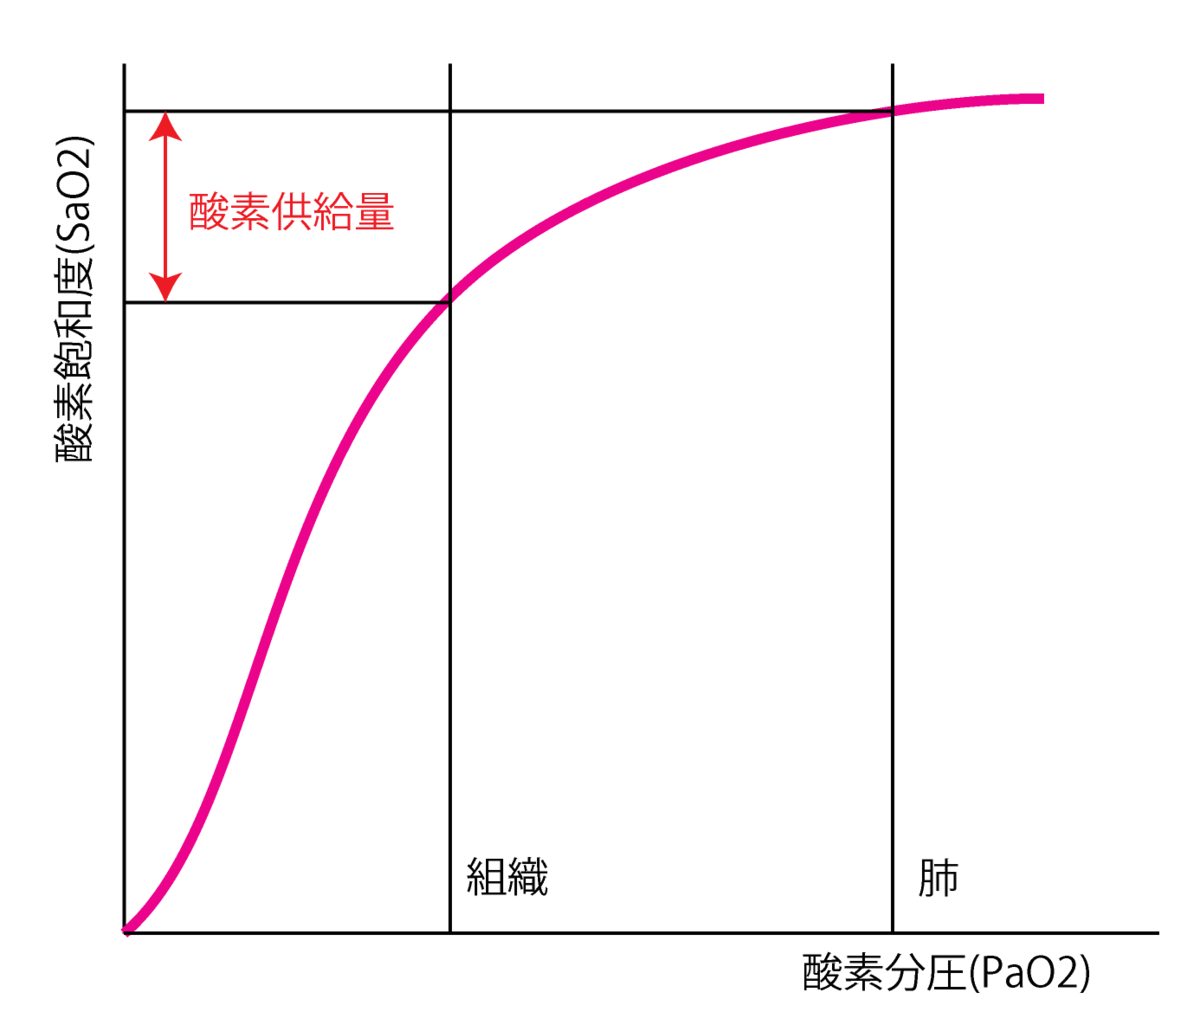 f:id:atsuhiro-me:20161015002416p:plain:w300